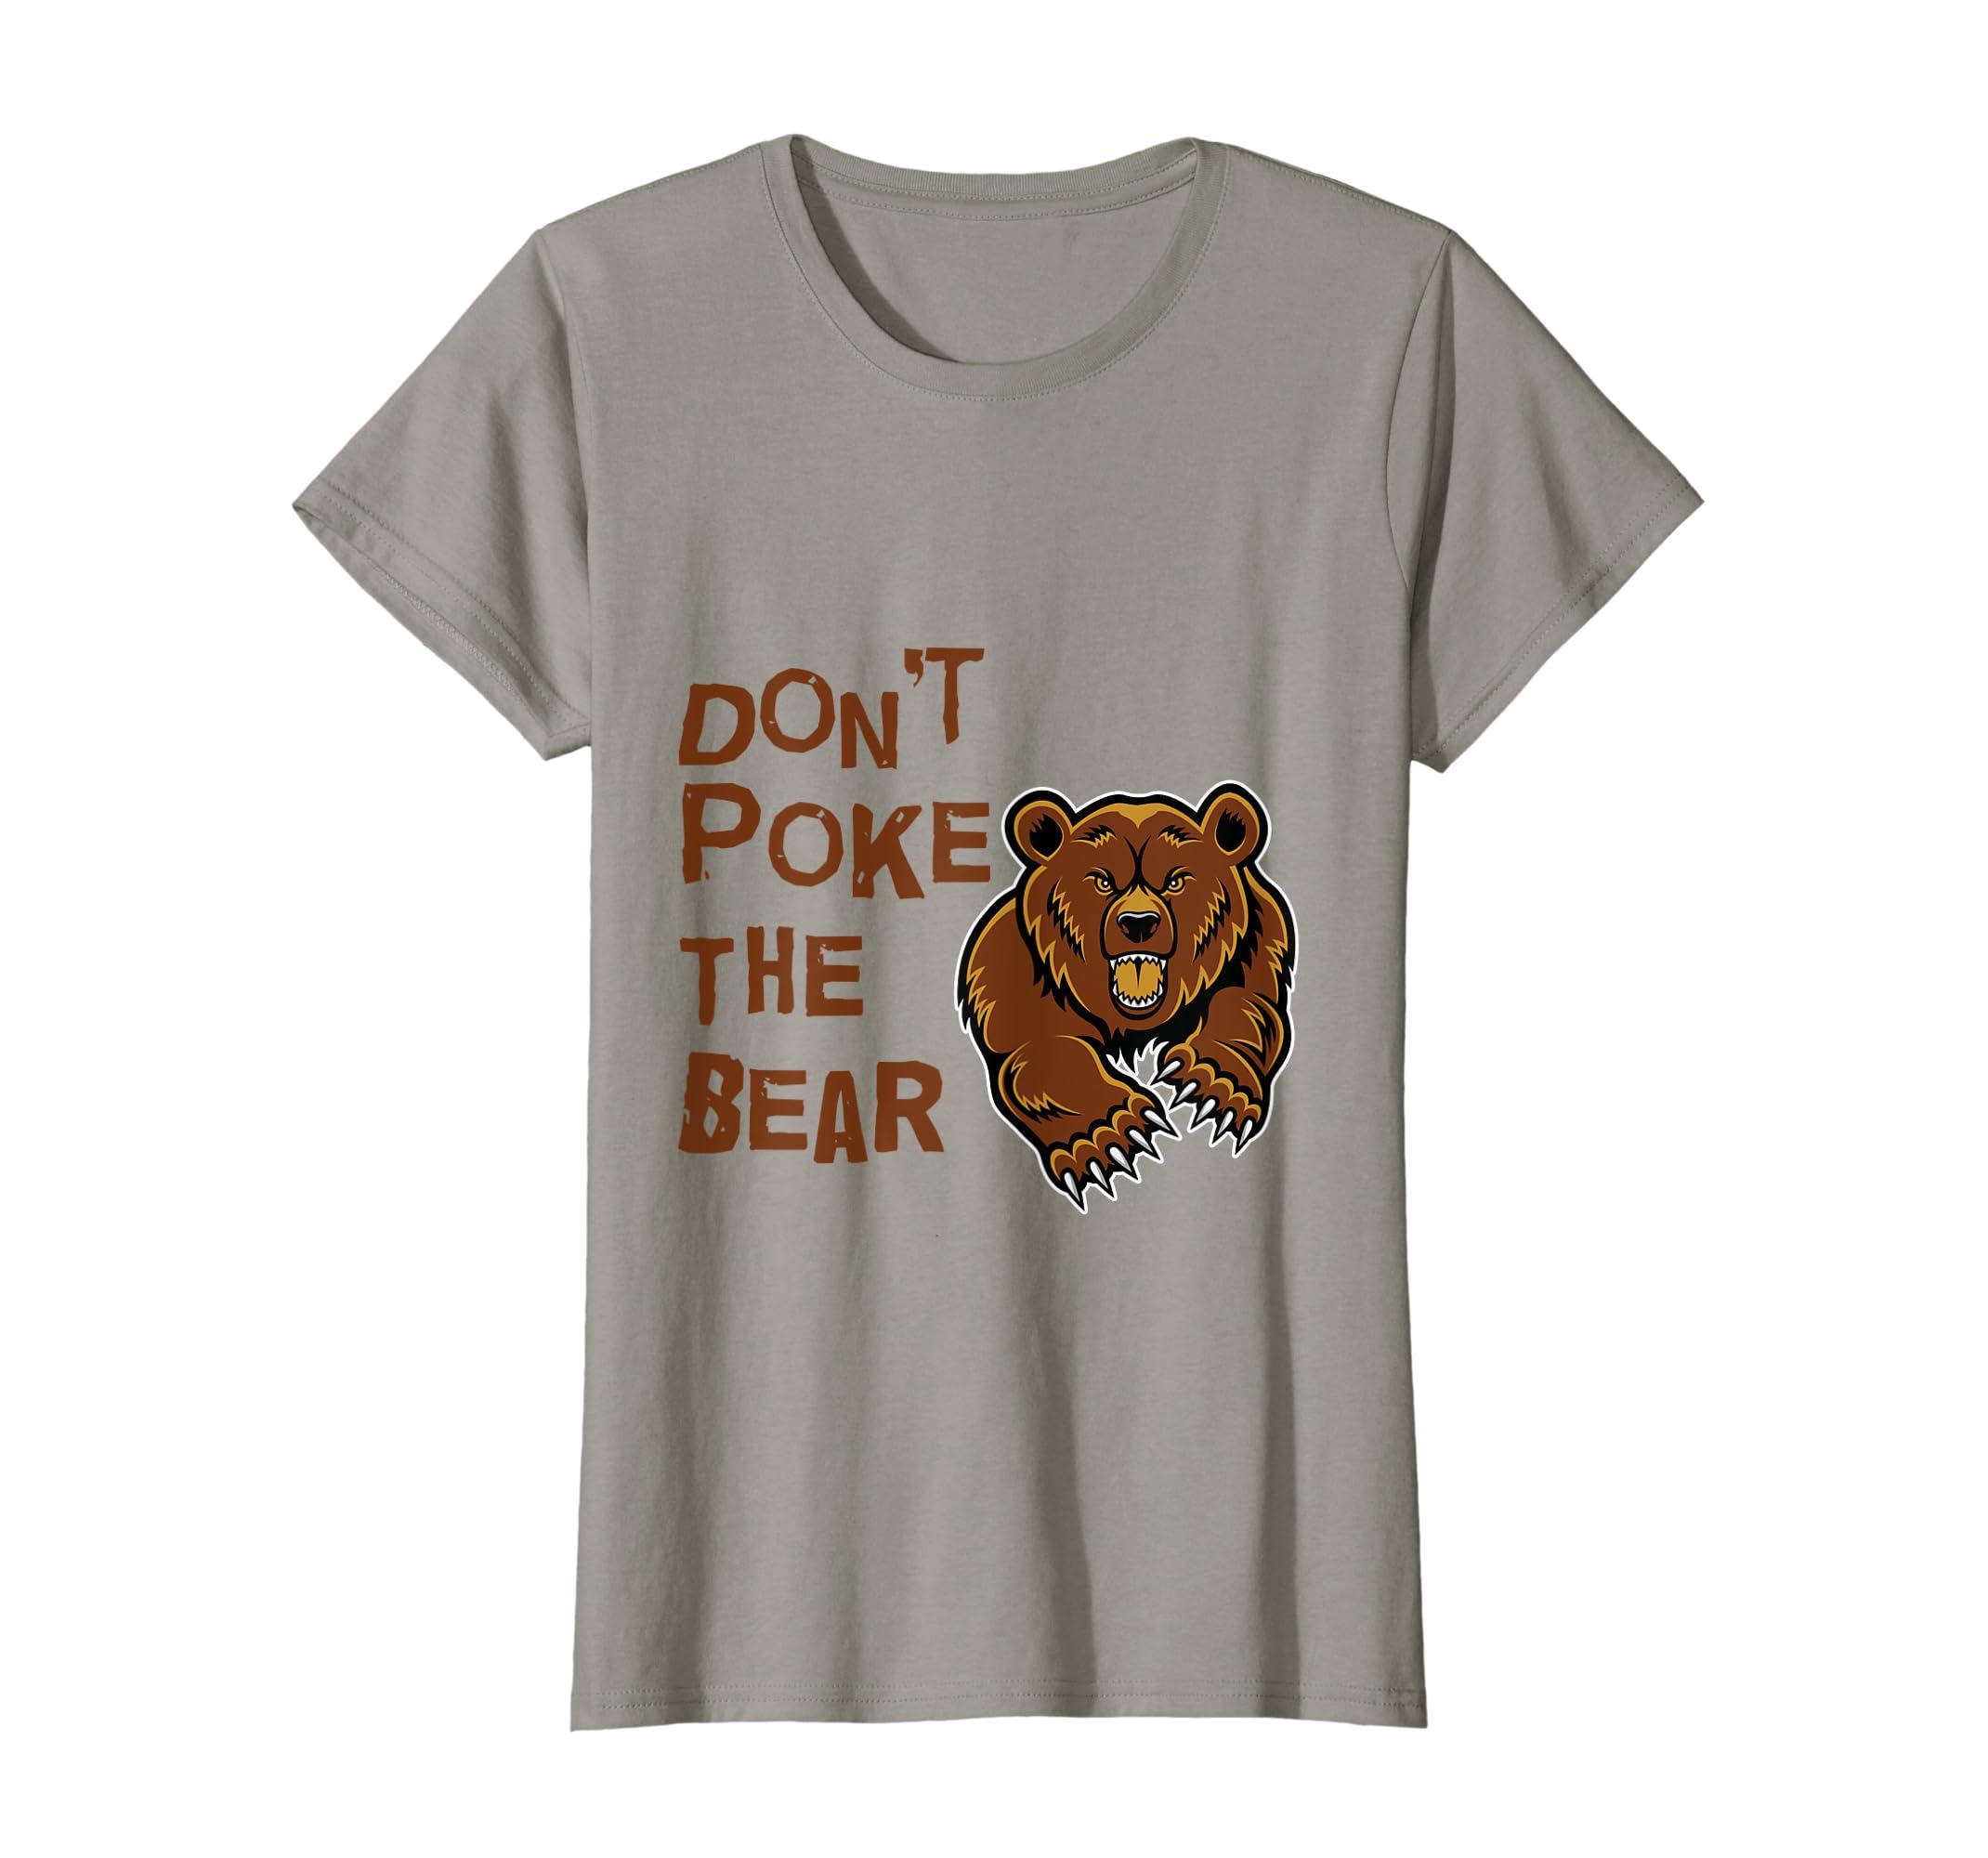 4d9c154d53f2 Amazon.com  Don t Poke The Bear T Shirt  Clothing